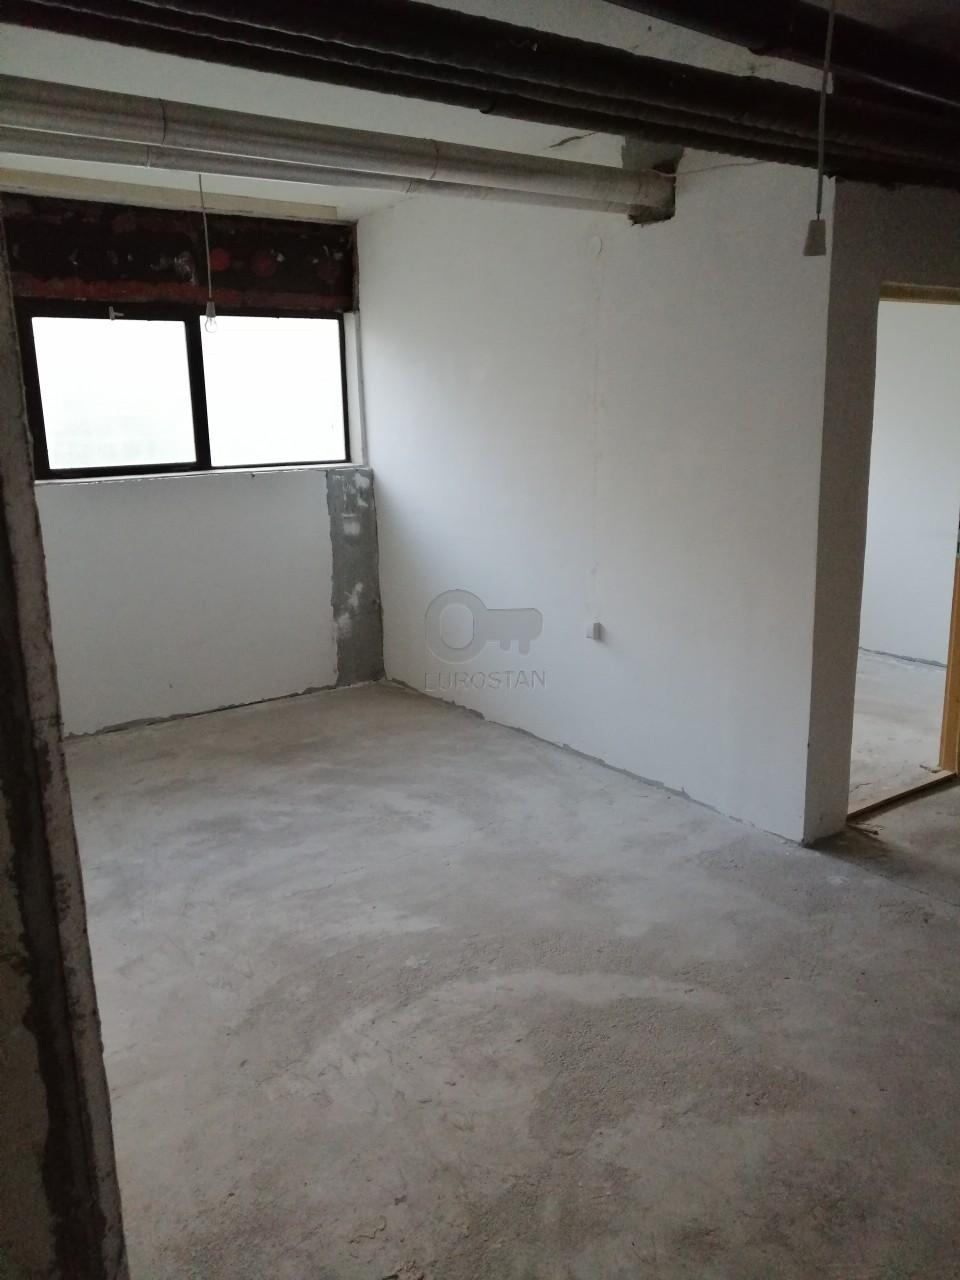 Poslovni prostor BORČA 25500 EUR